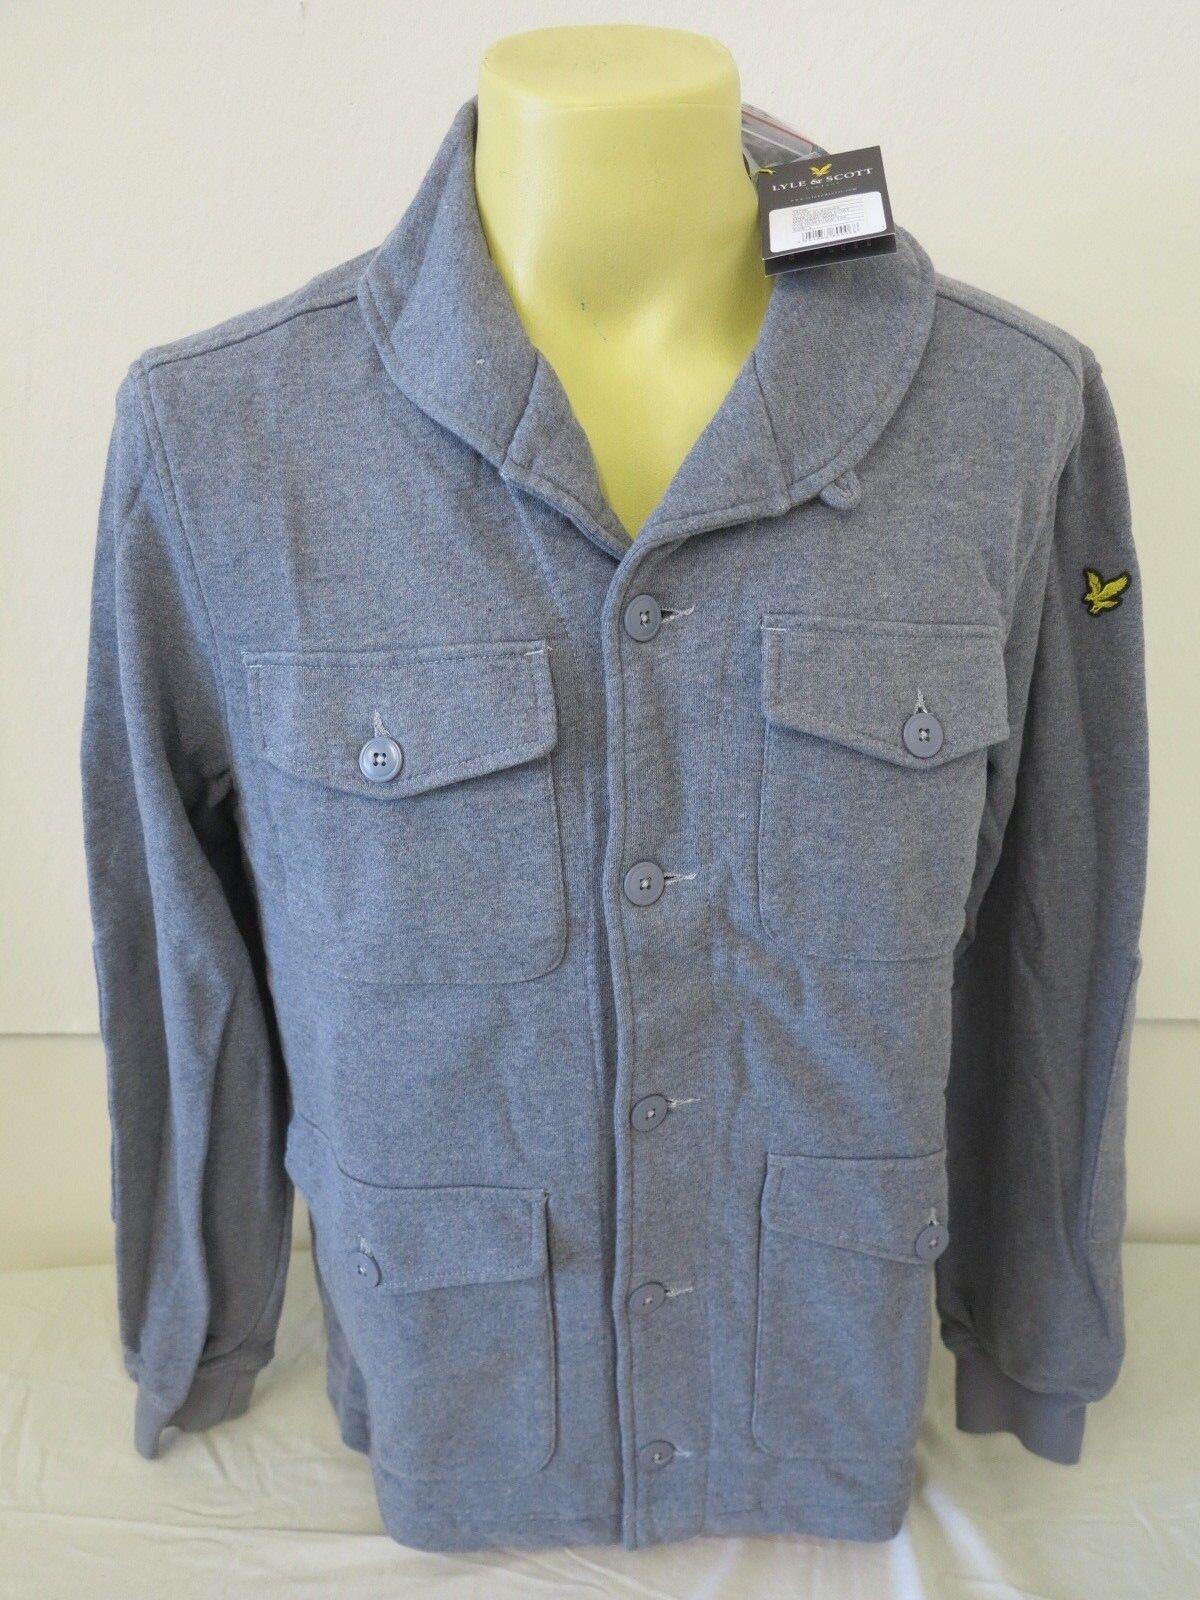 Lyle & Scott Vintage Mens Hunting Coat Jacket Mid grau Marl L Large 200 New